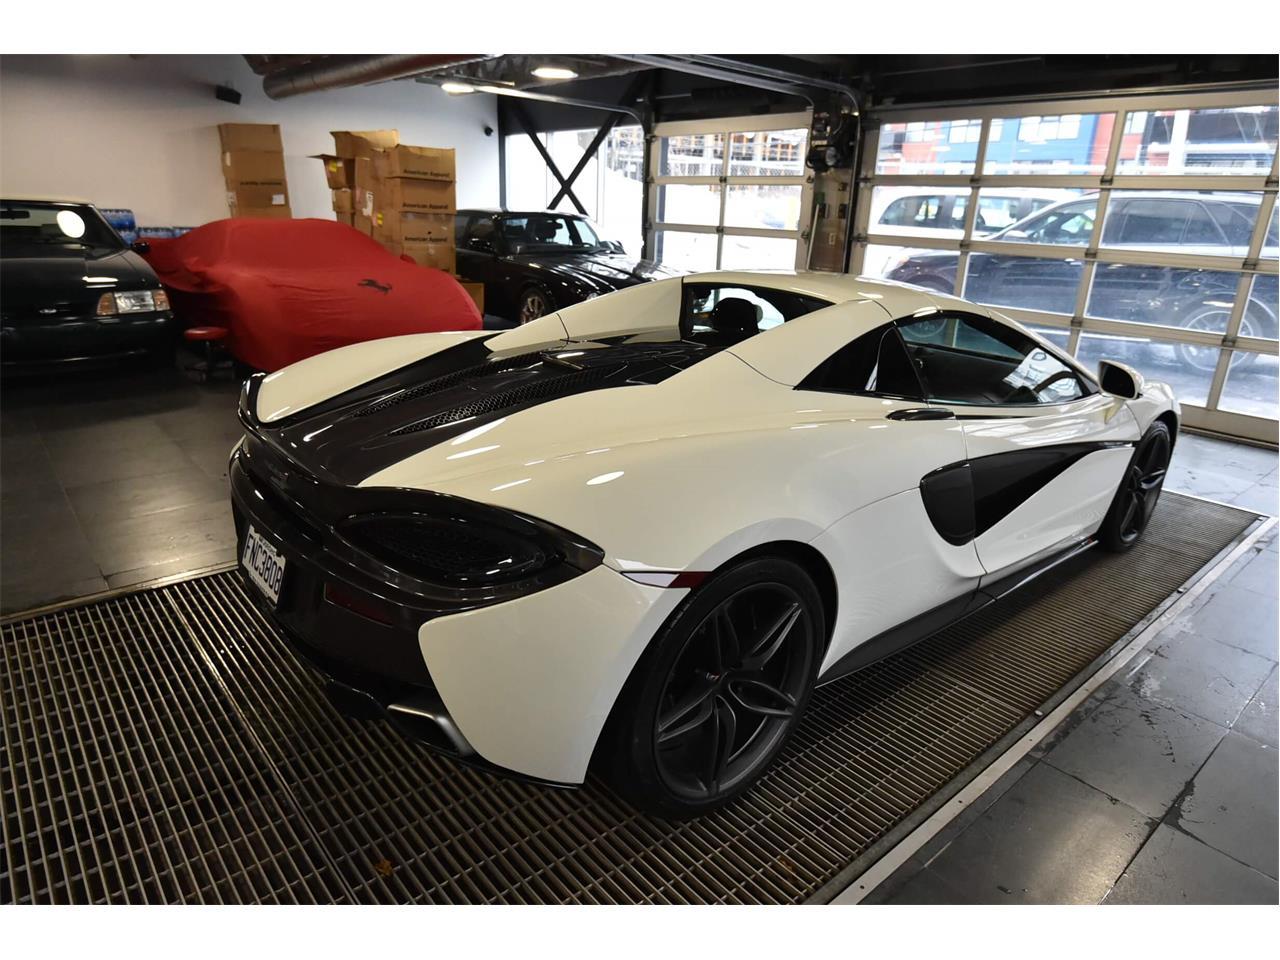 2018 McLaren 570S (CC-1215269) for sale in Montreal, Quebec